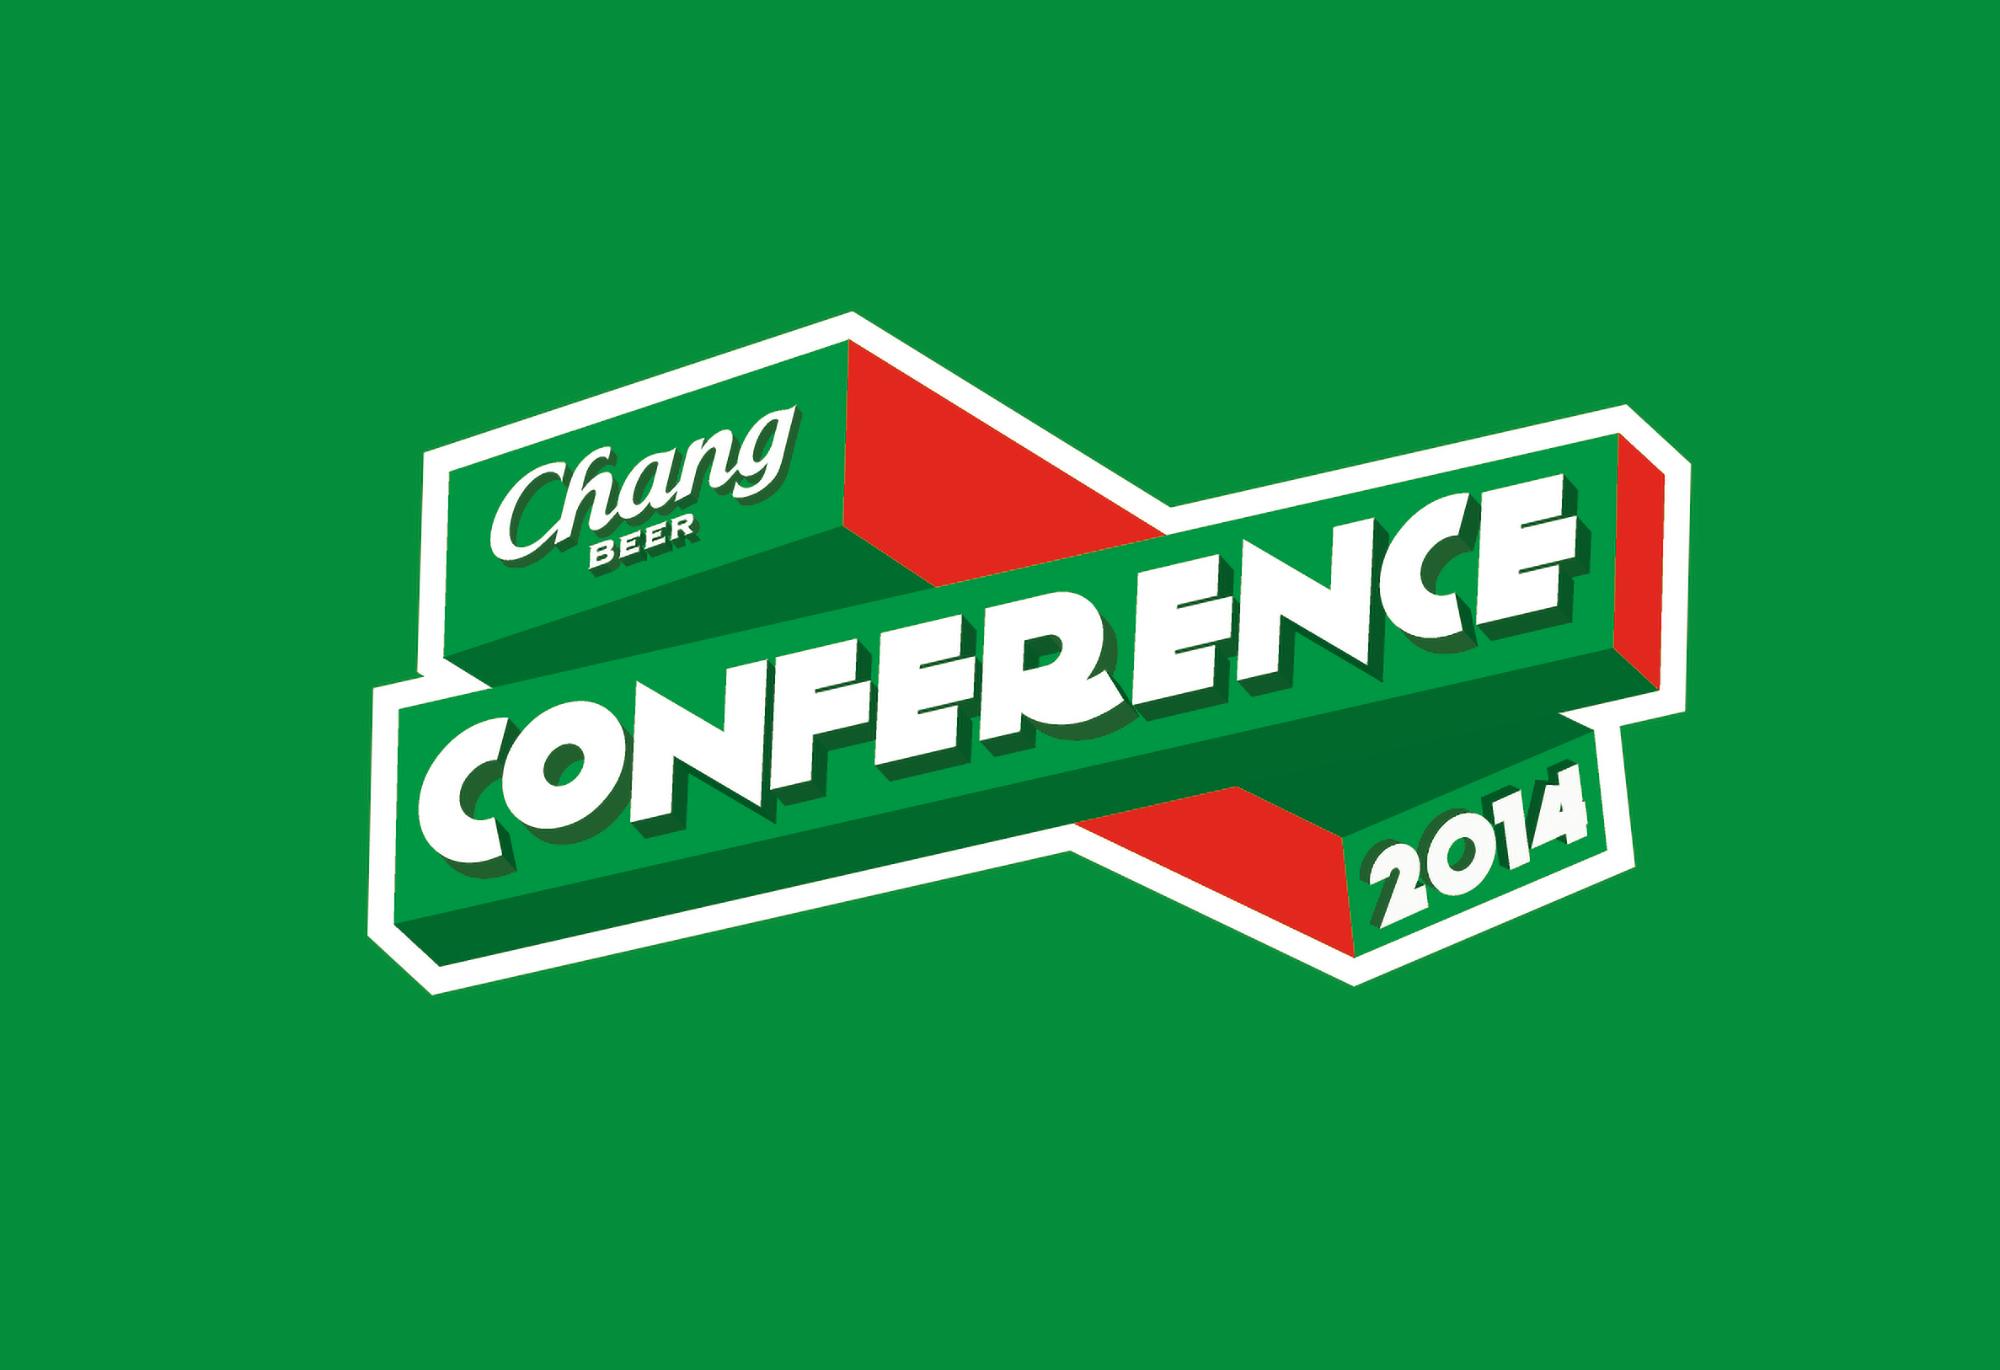 Chang Conference logo